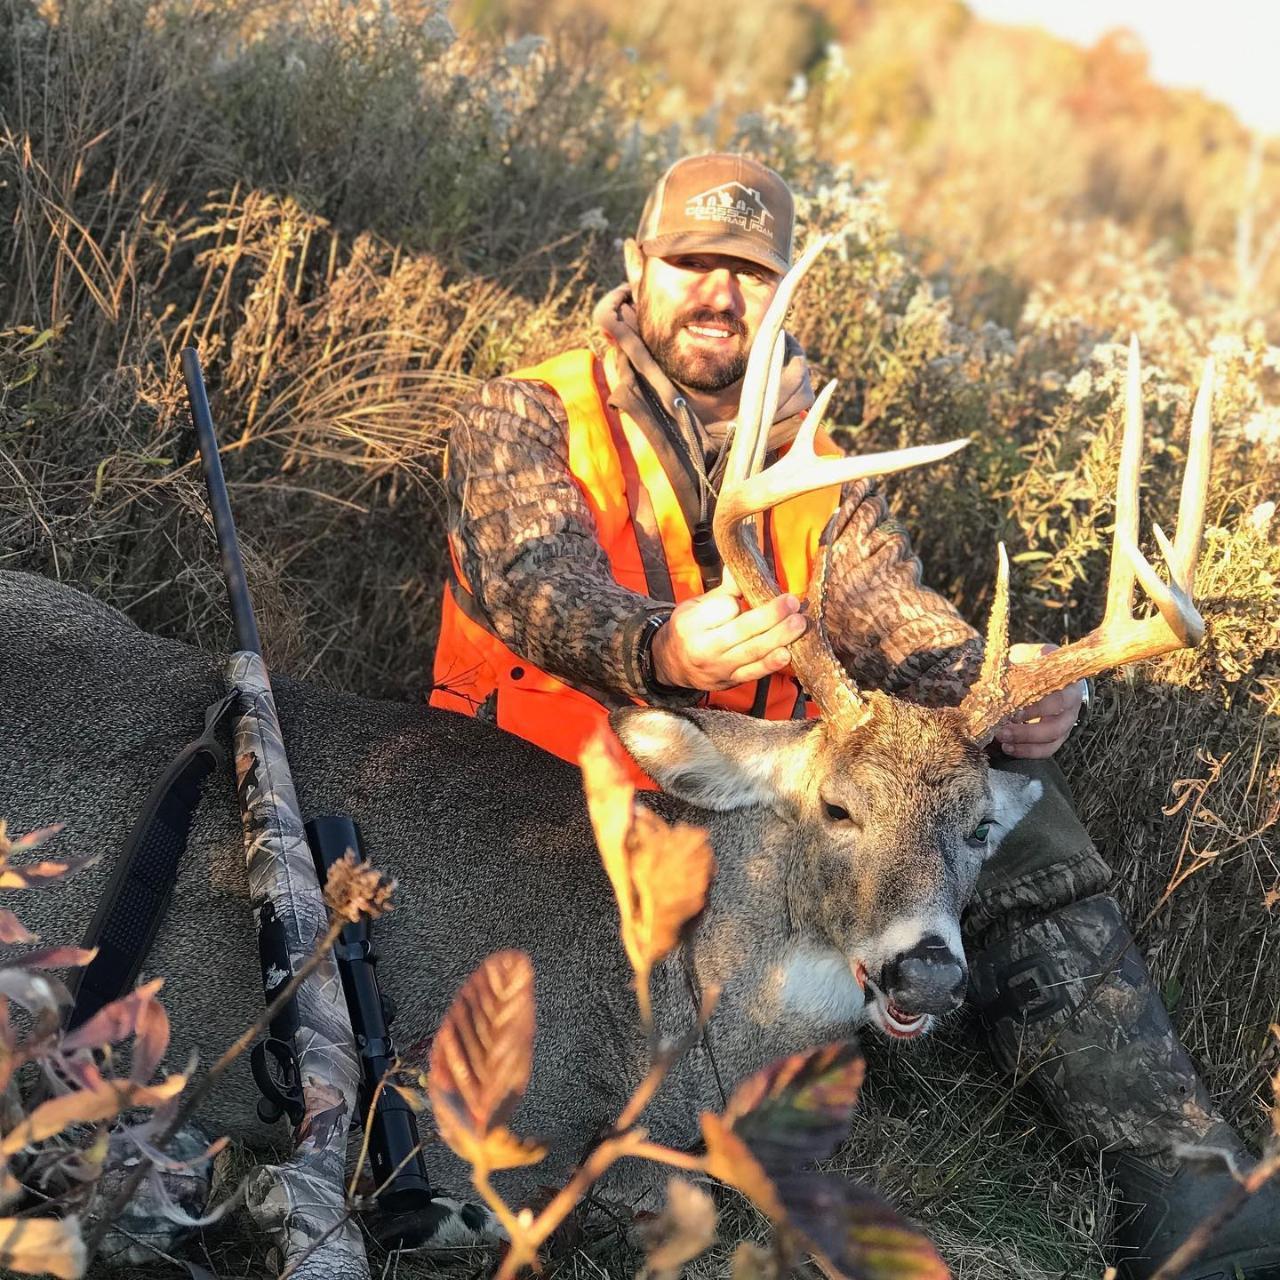 West Camp Kentucky 7 Day 8 Night Rut Bow Hunt - Whitetail in Kentucky Deer Season 2021